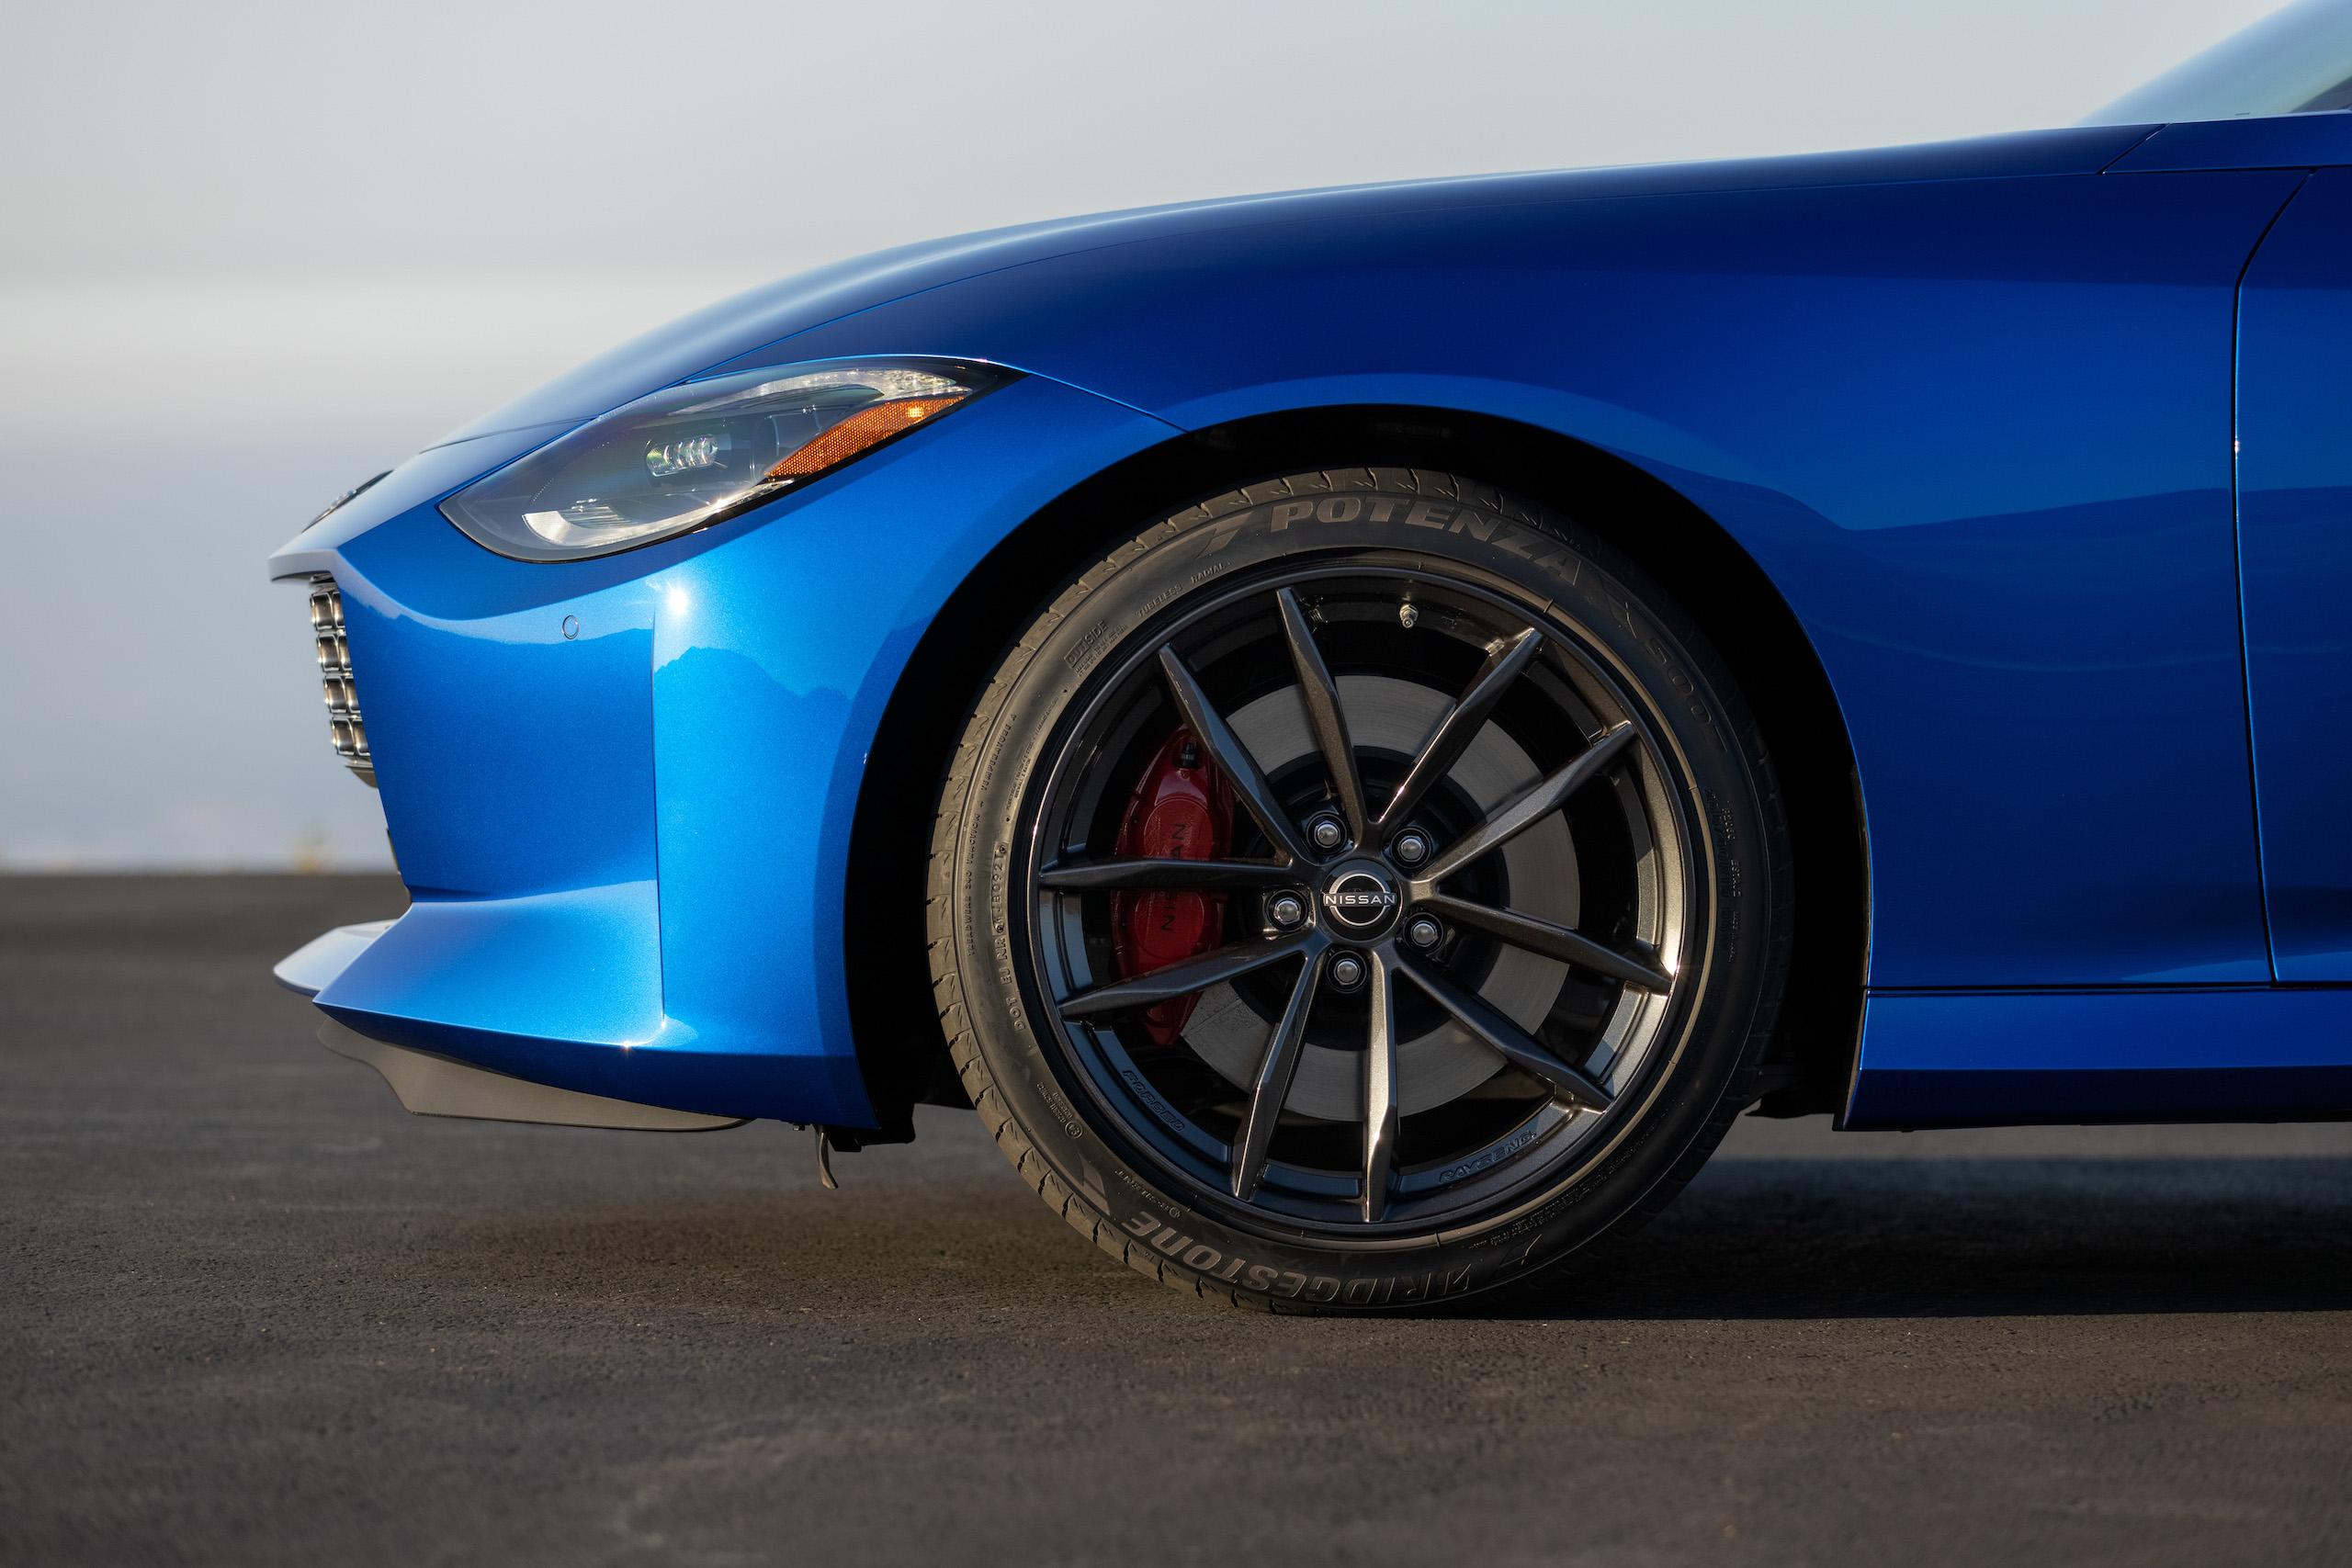 2023 Nissan Z front fascia profile